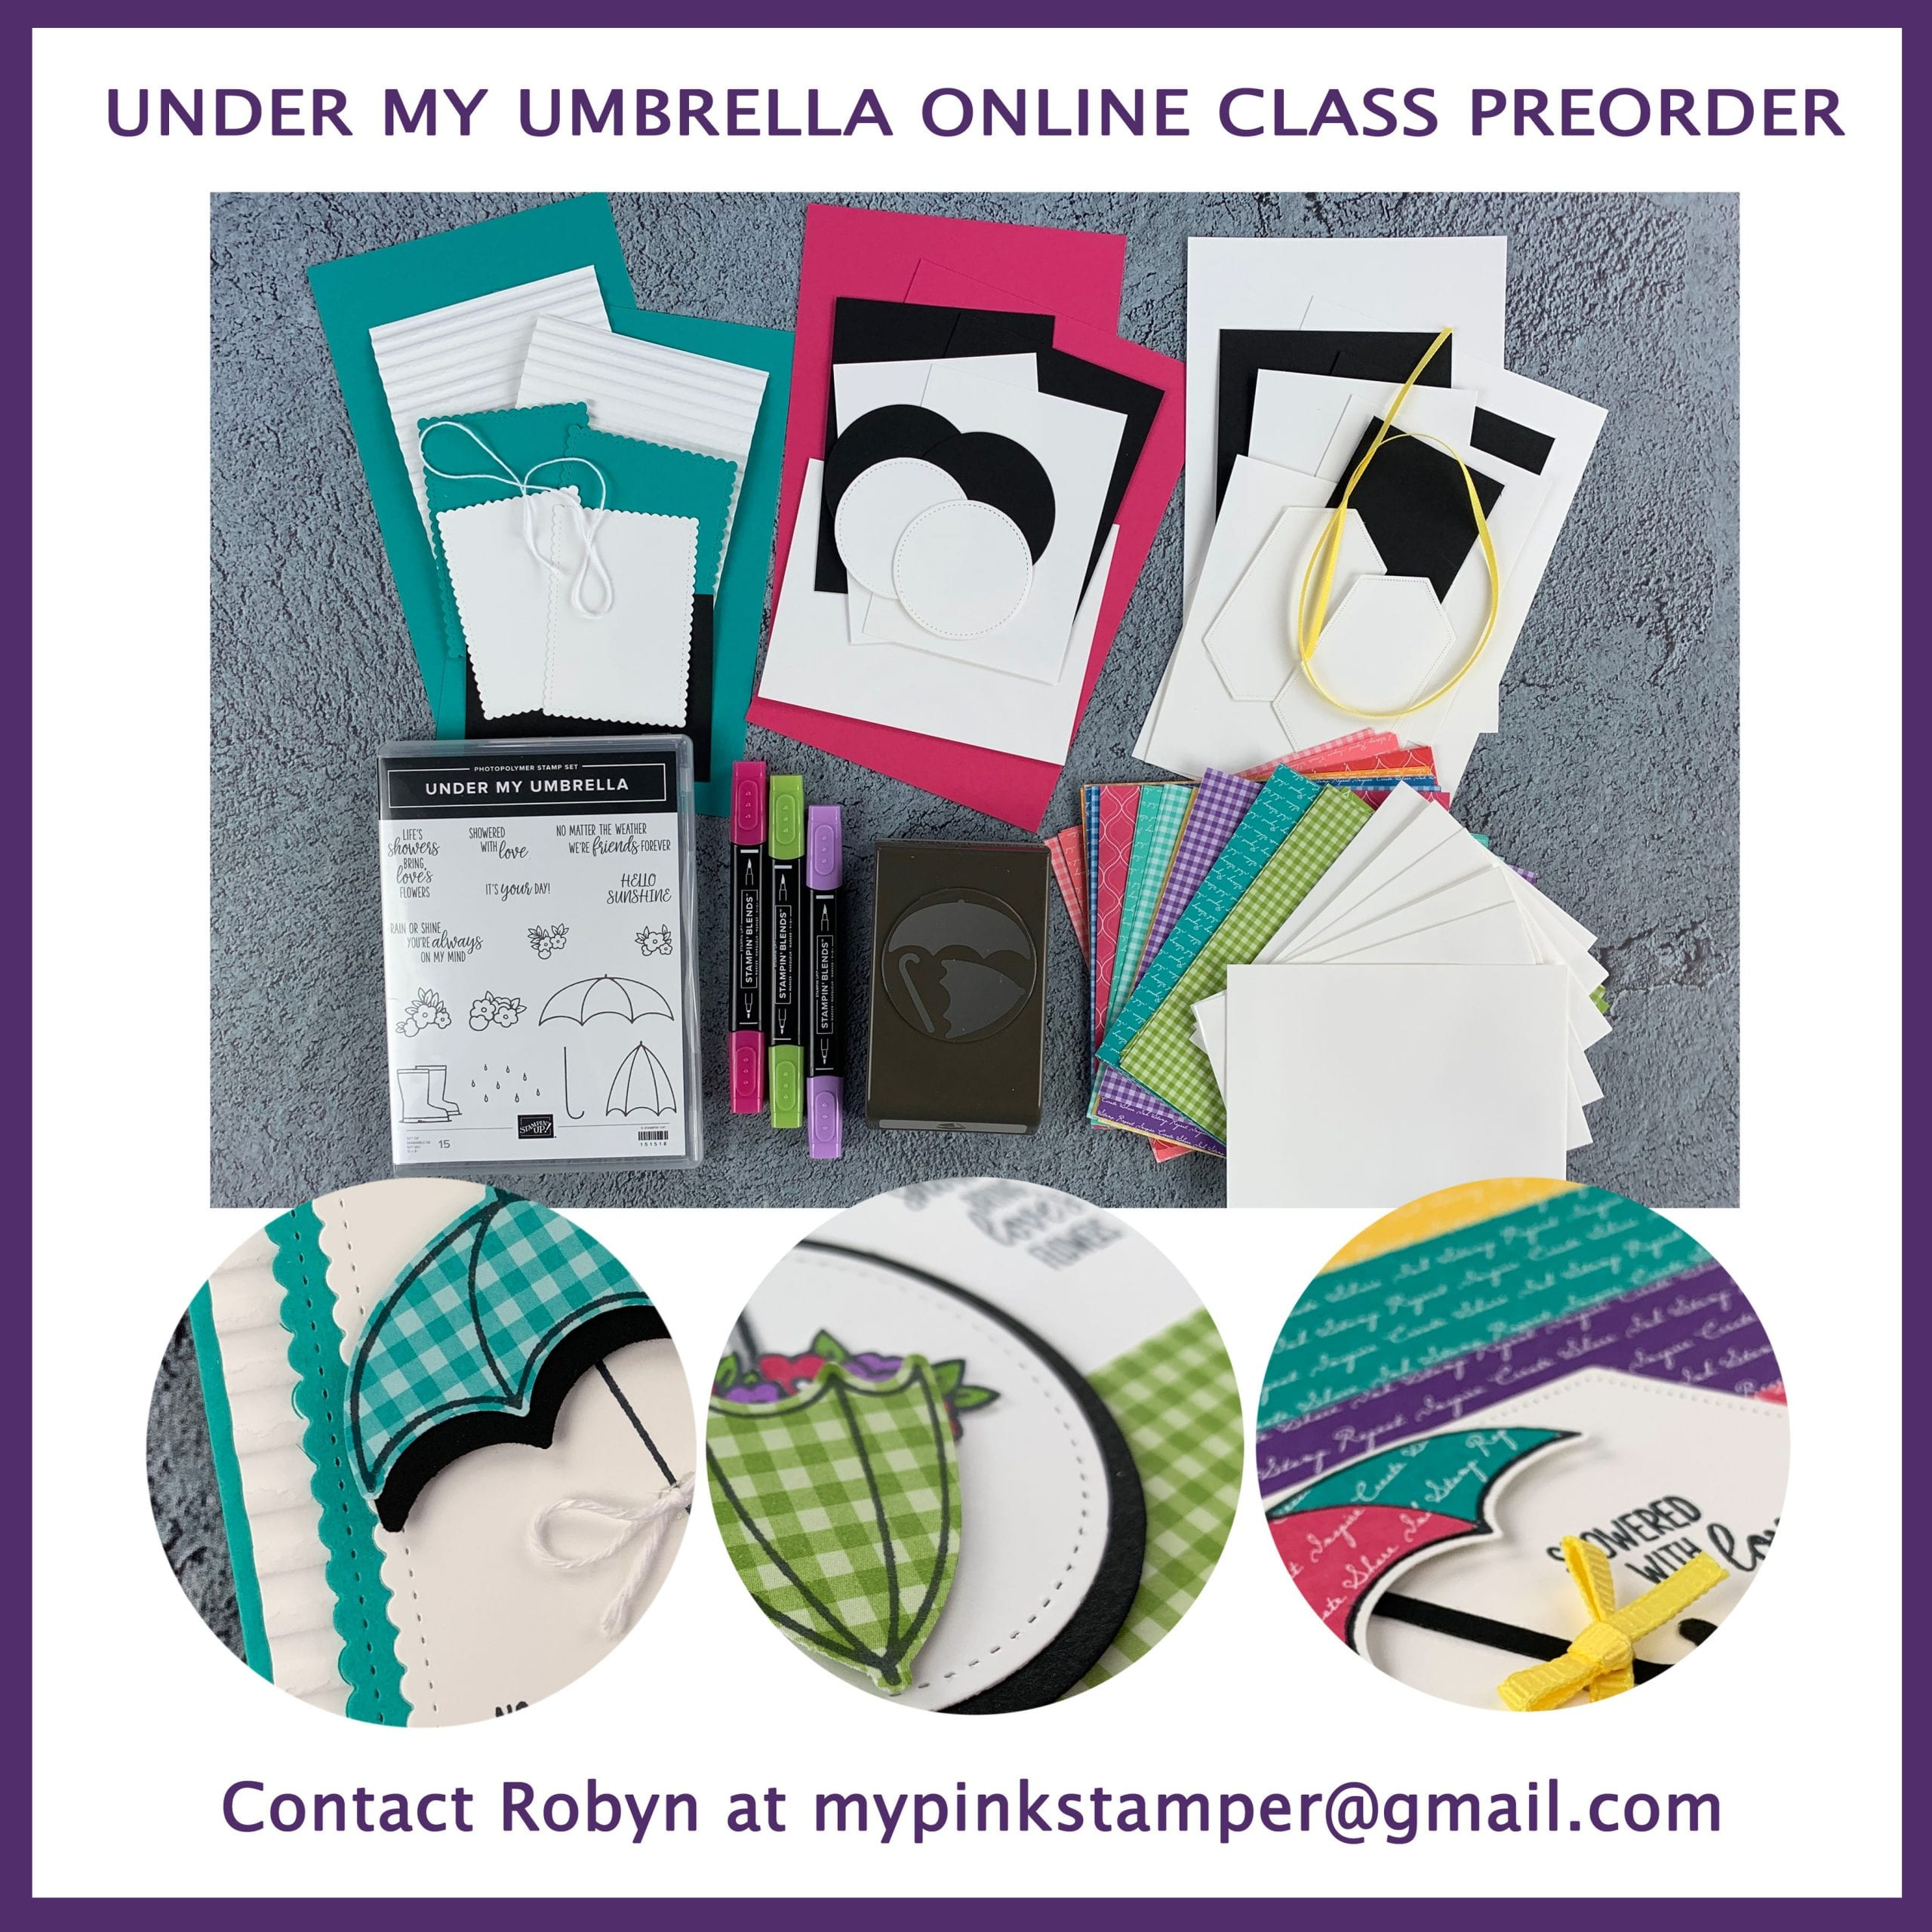 Under My Umbrella Online Class Preorder (Class by Mail)